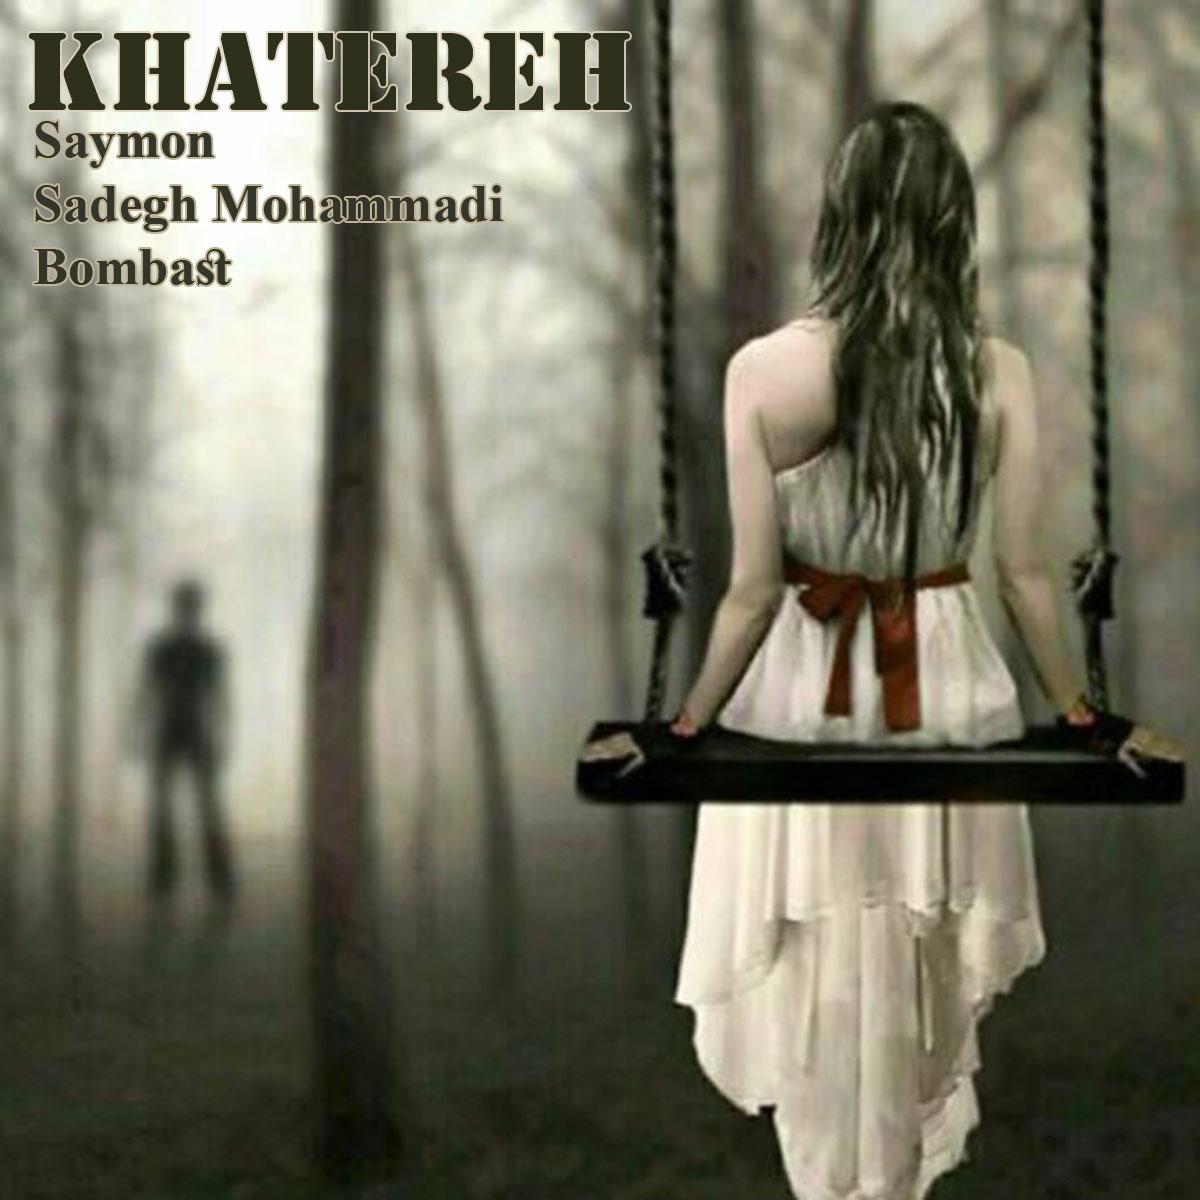 Saymon & Sadegh Mohammadi & Bombast – Khatereh